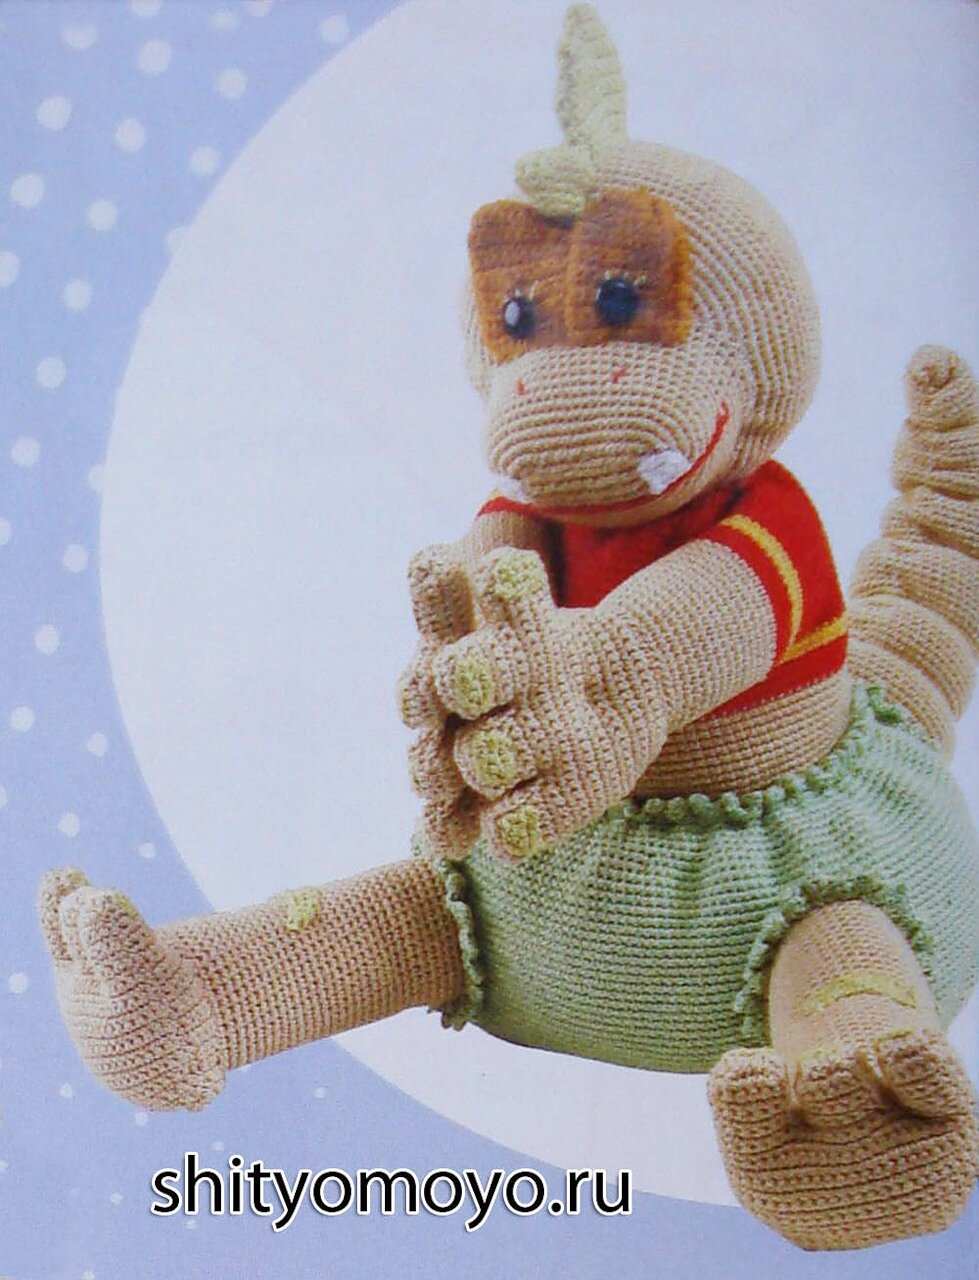 игрушки своими руками динозавр